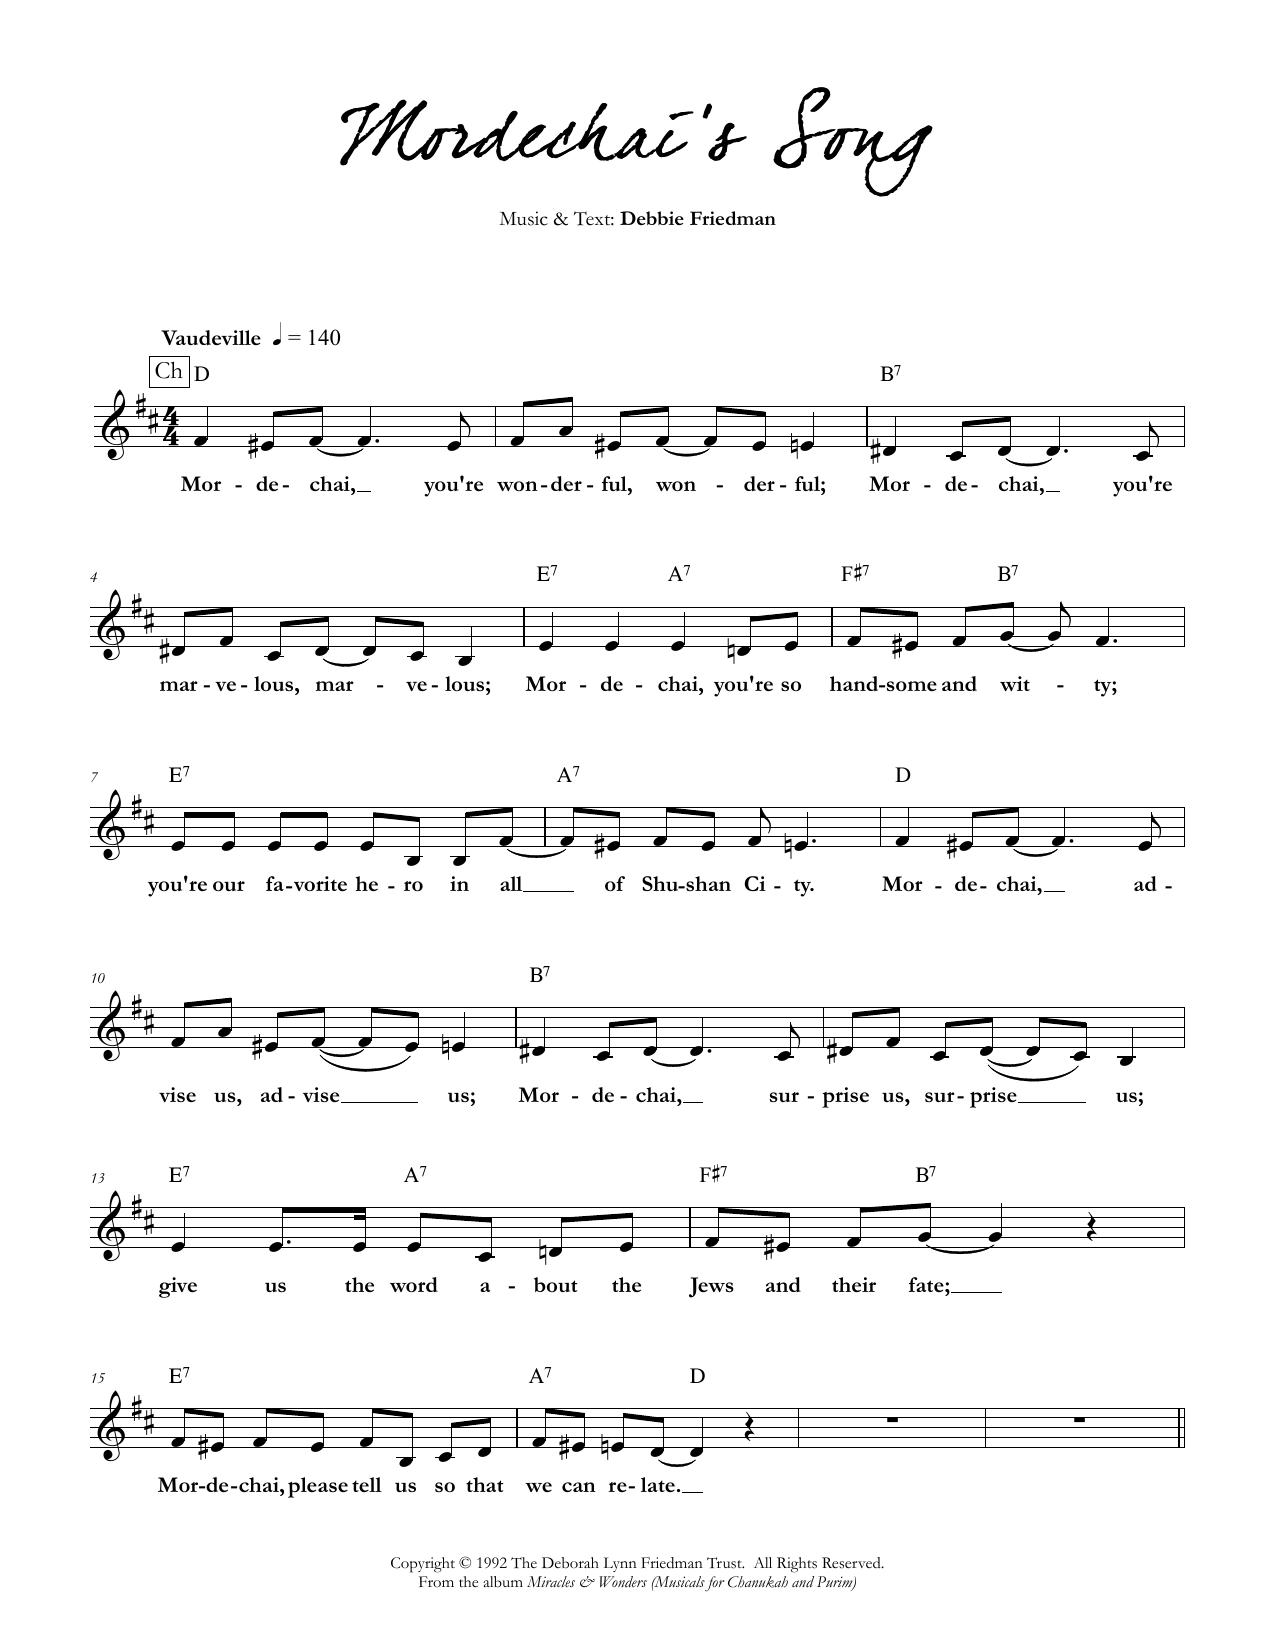 Mordechai's Song Sheet Music